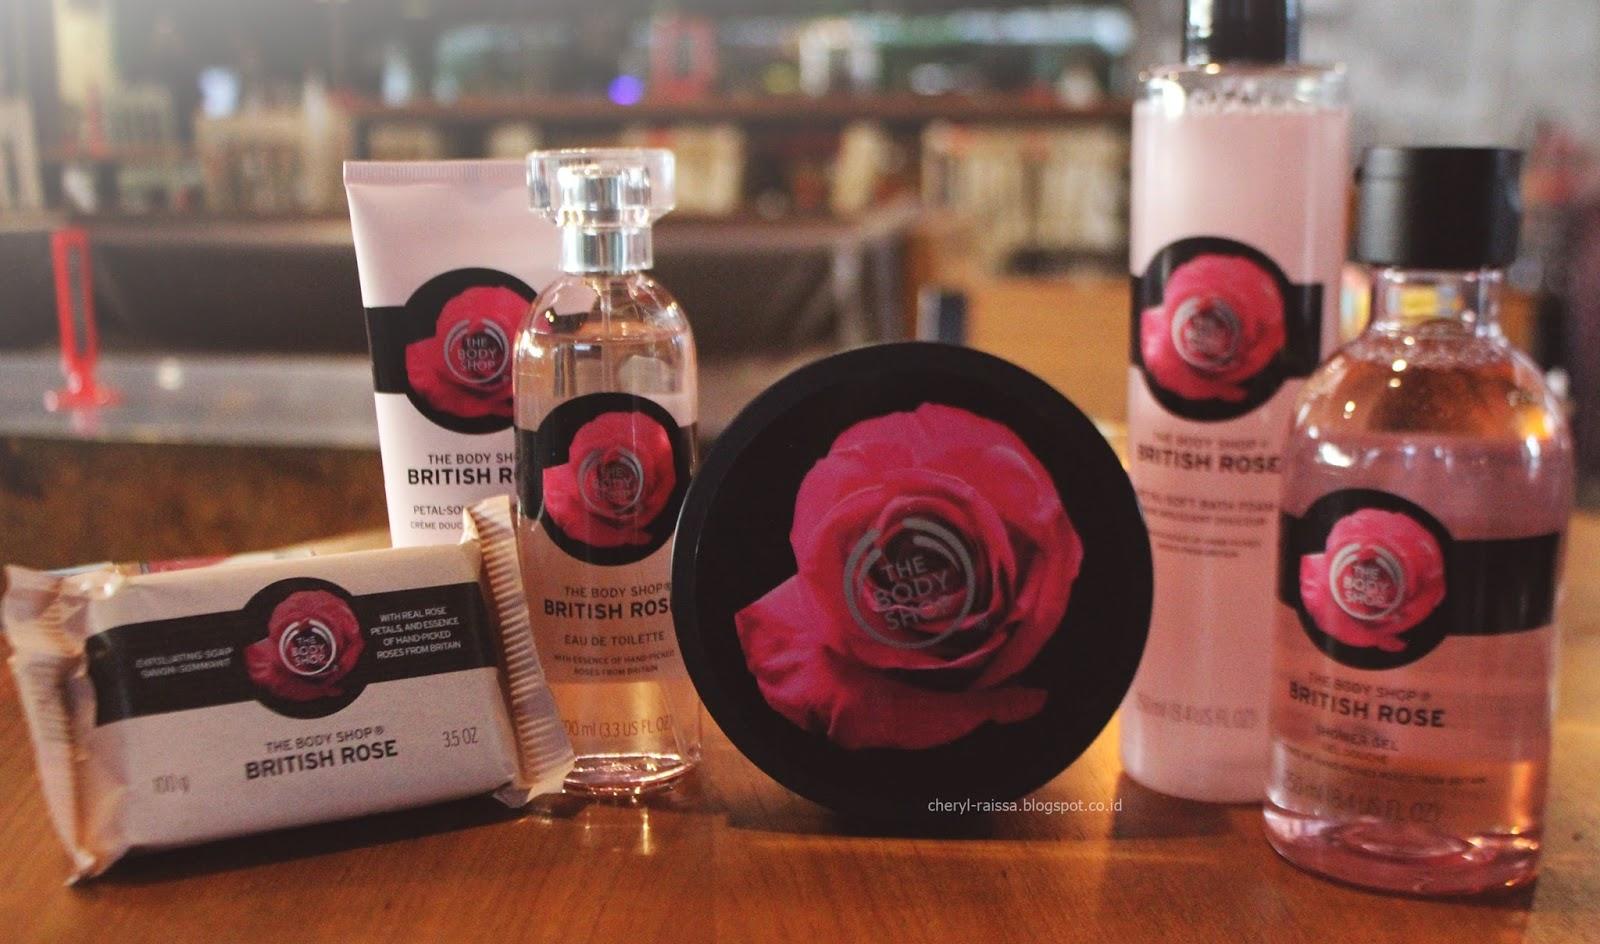 British Rose Body Care By The Shop Cheryl Raissa Paket Lotion Dan Shower Gel